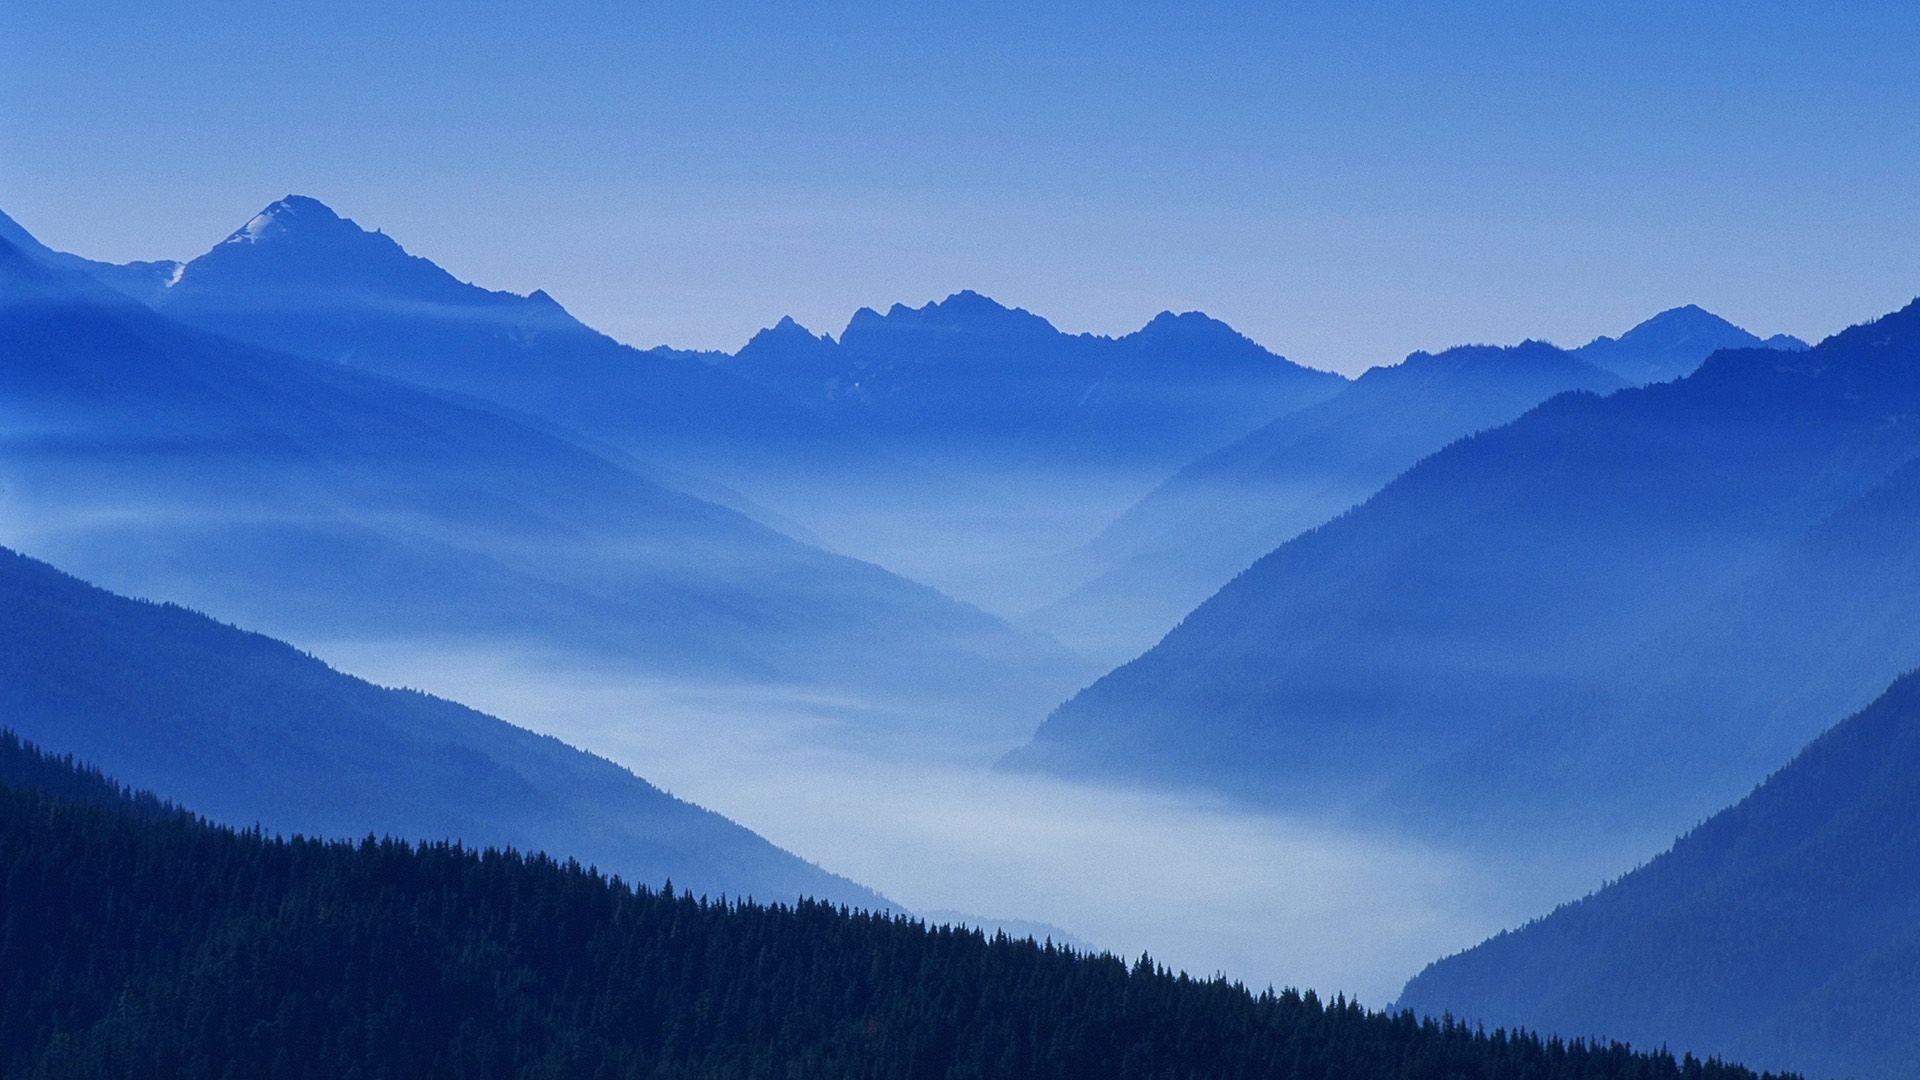 Popular Wallpaper Mountain Fog - b0a14945ee1376a83413e53604b89724  Gallery_225398.jpg